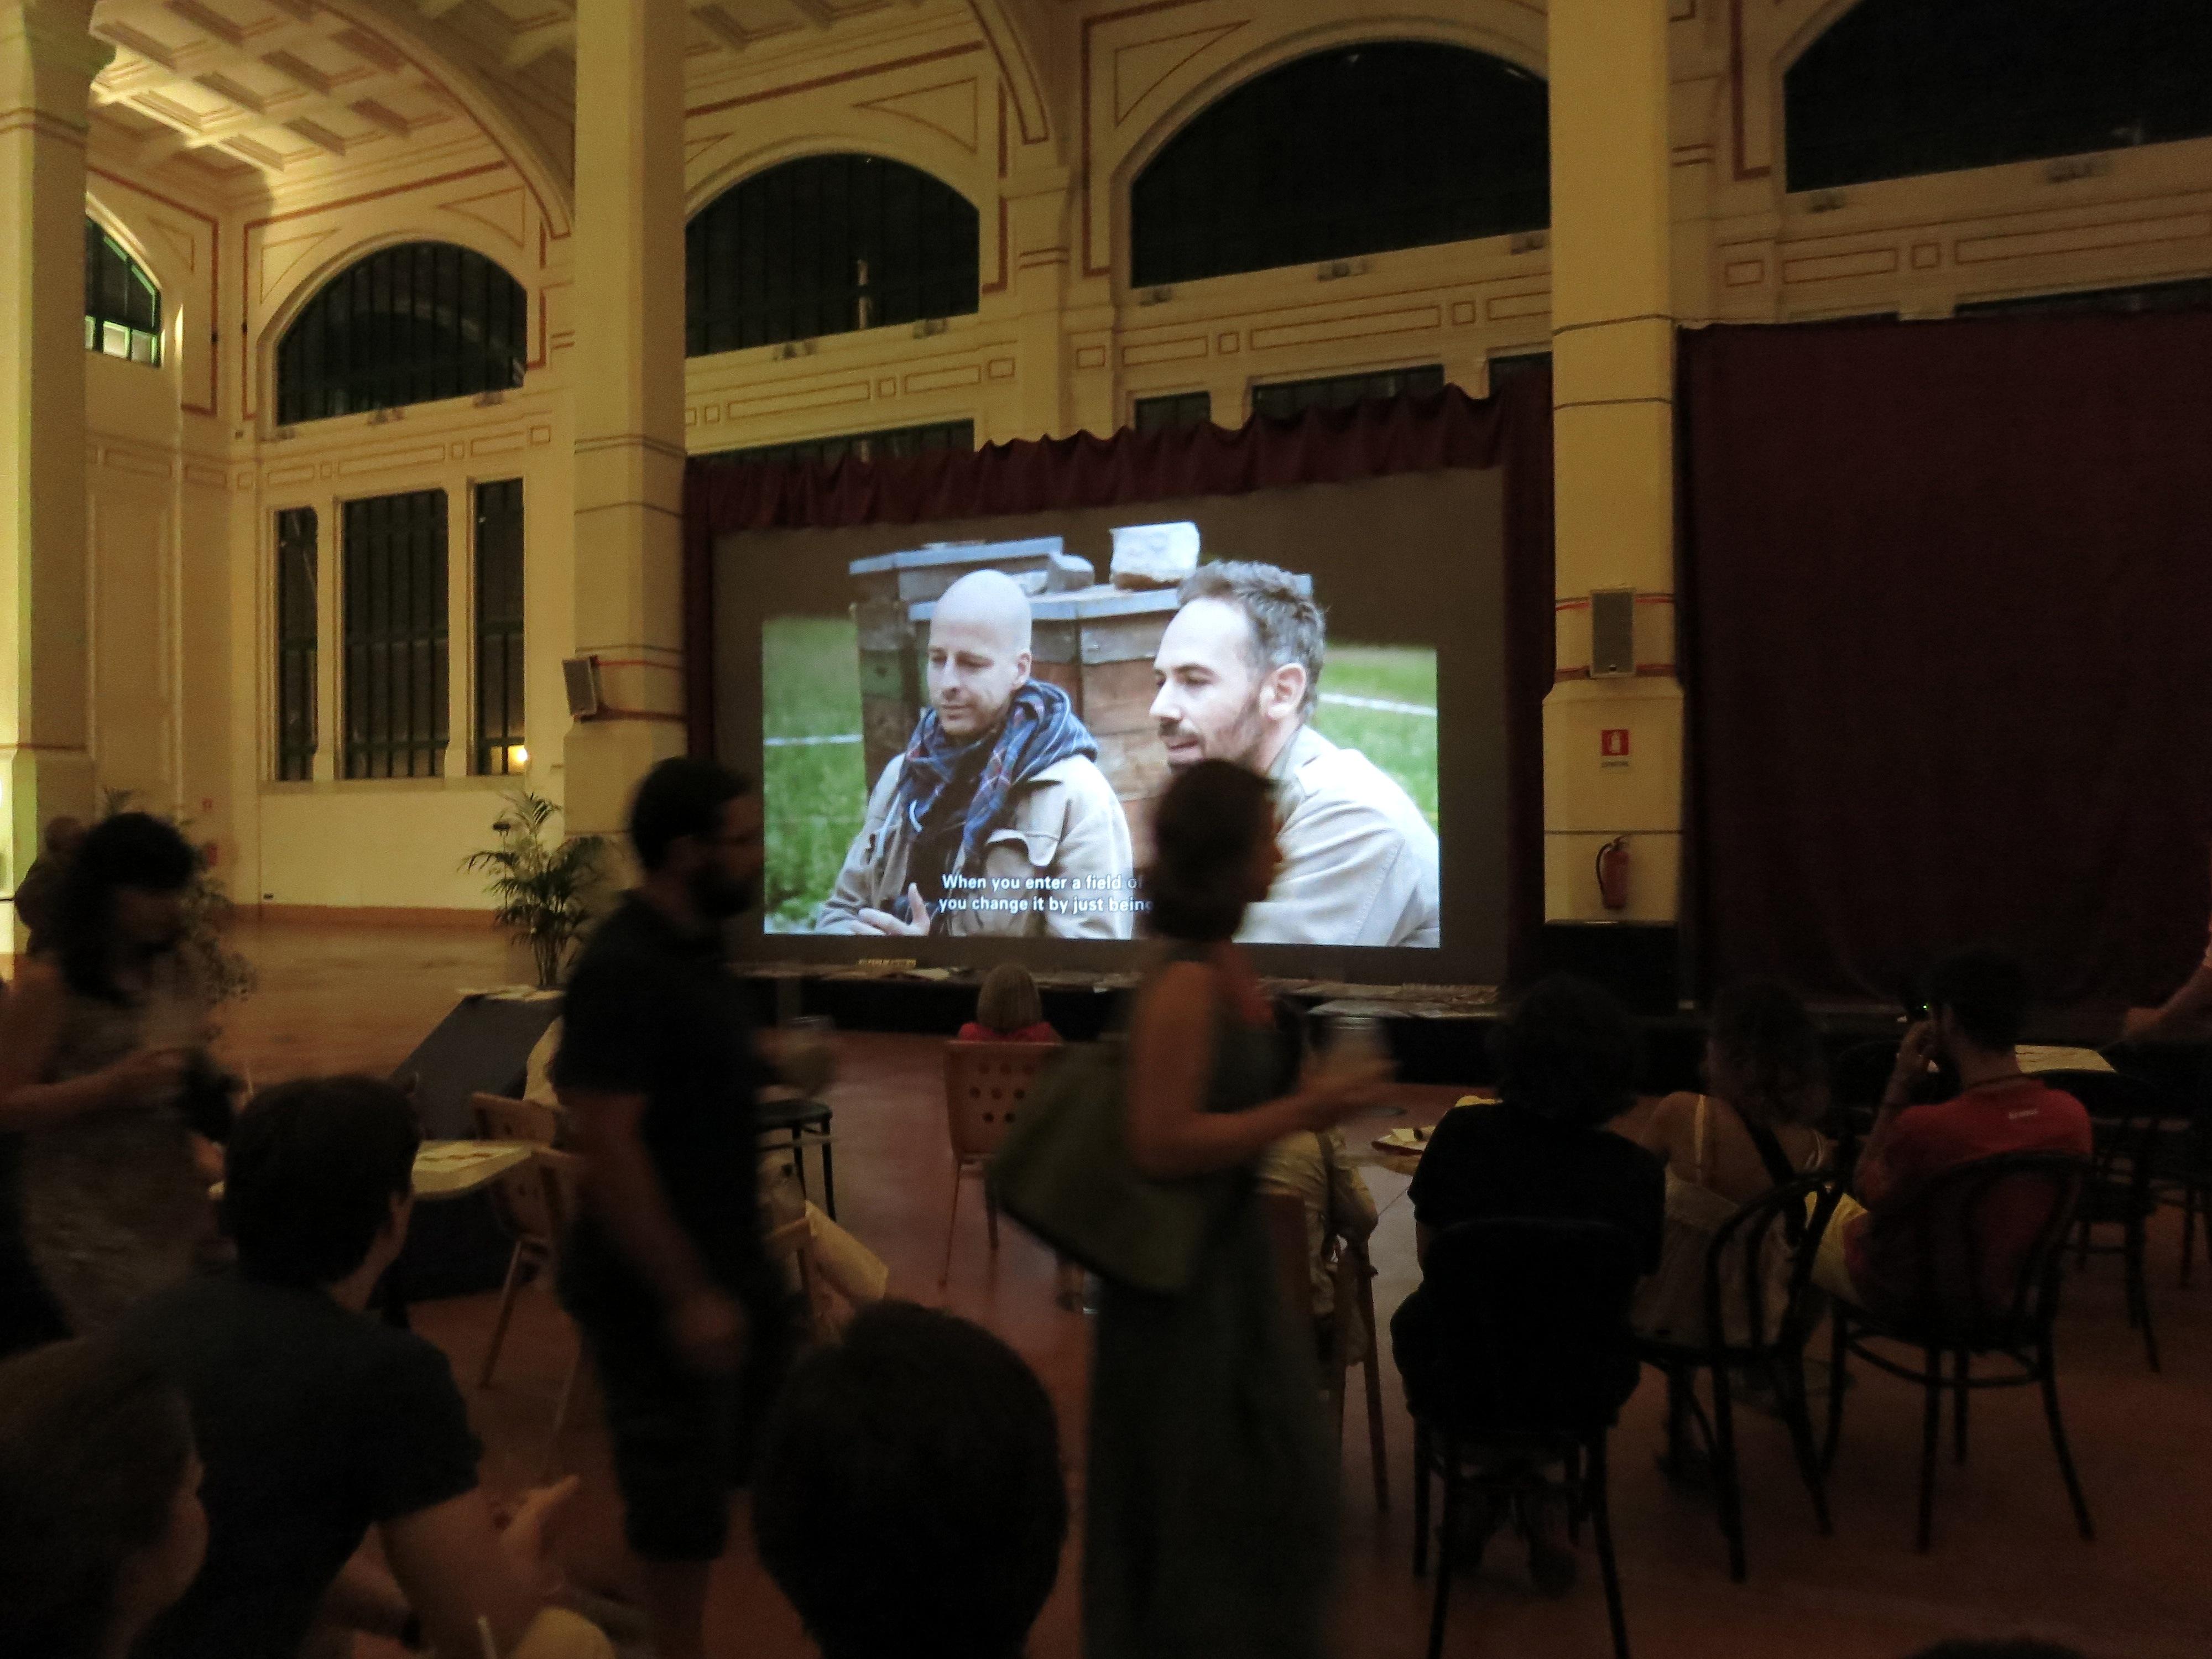 Salotto Viennese Trieste.Paul Divjak Music